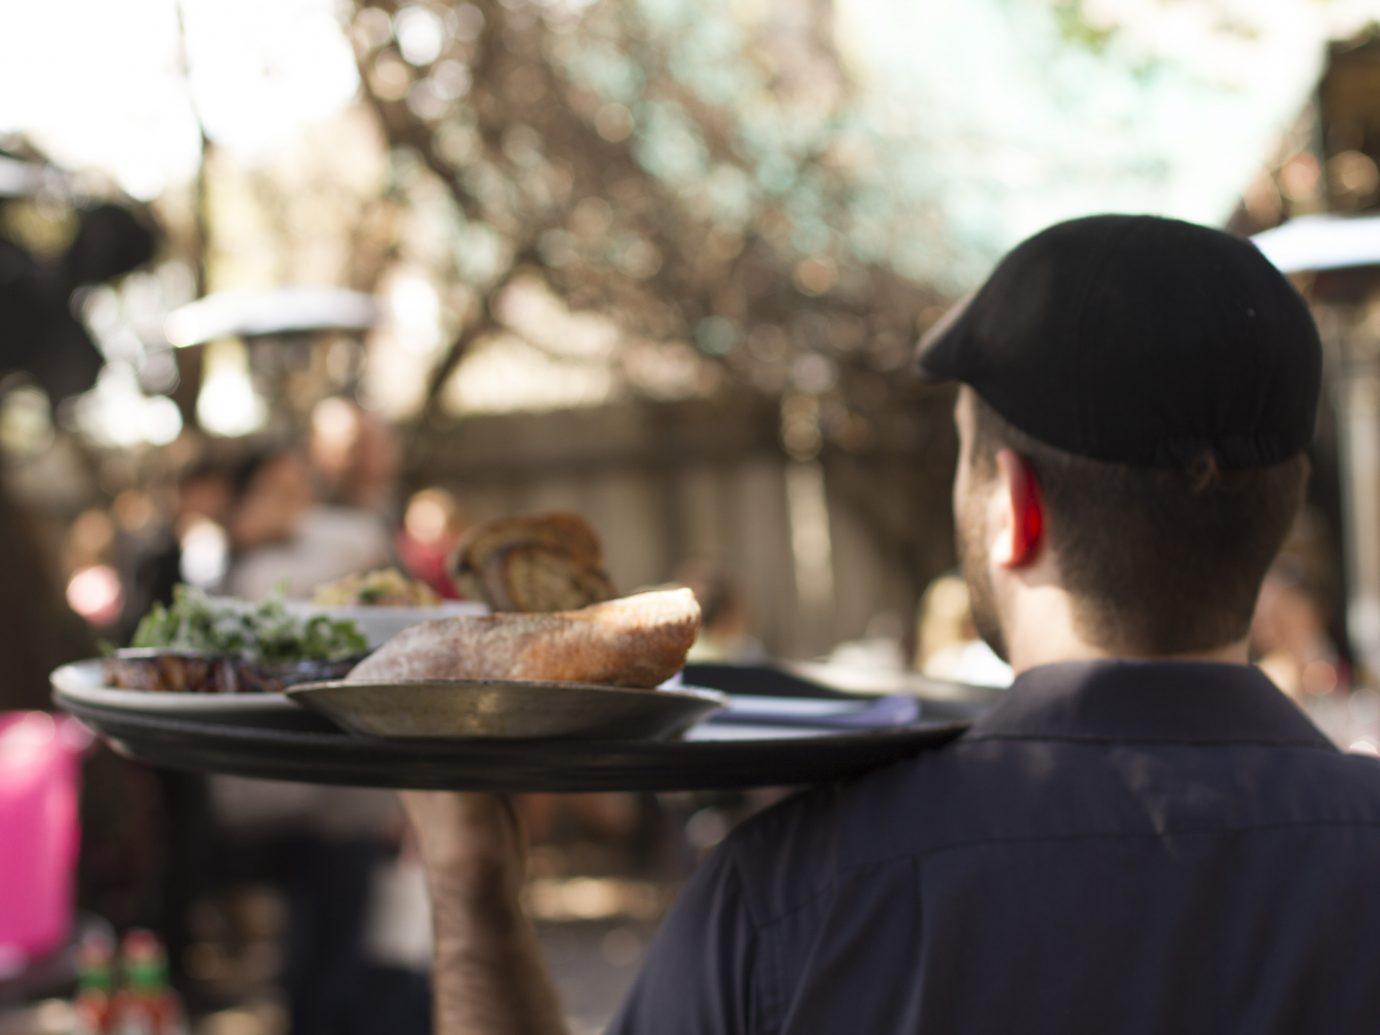 tray of food outdoors at Bacchanal